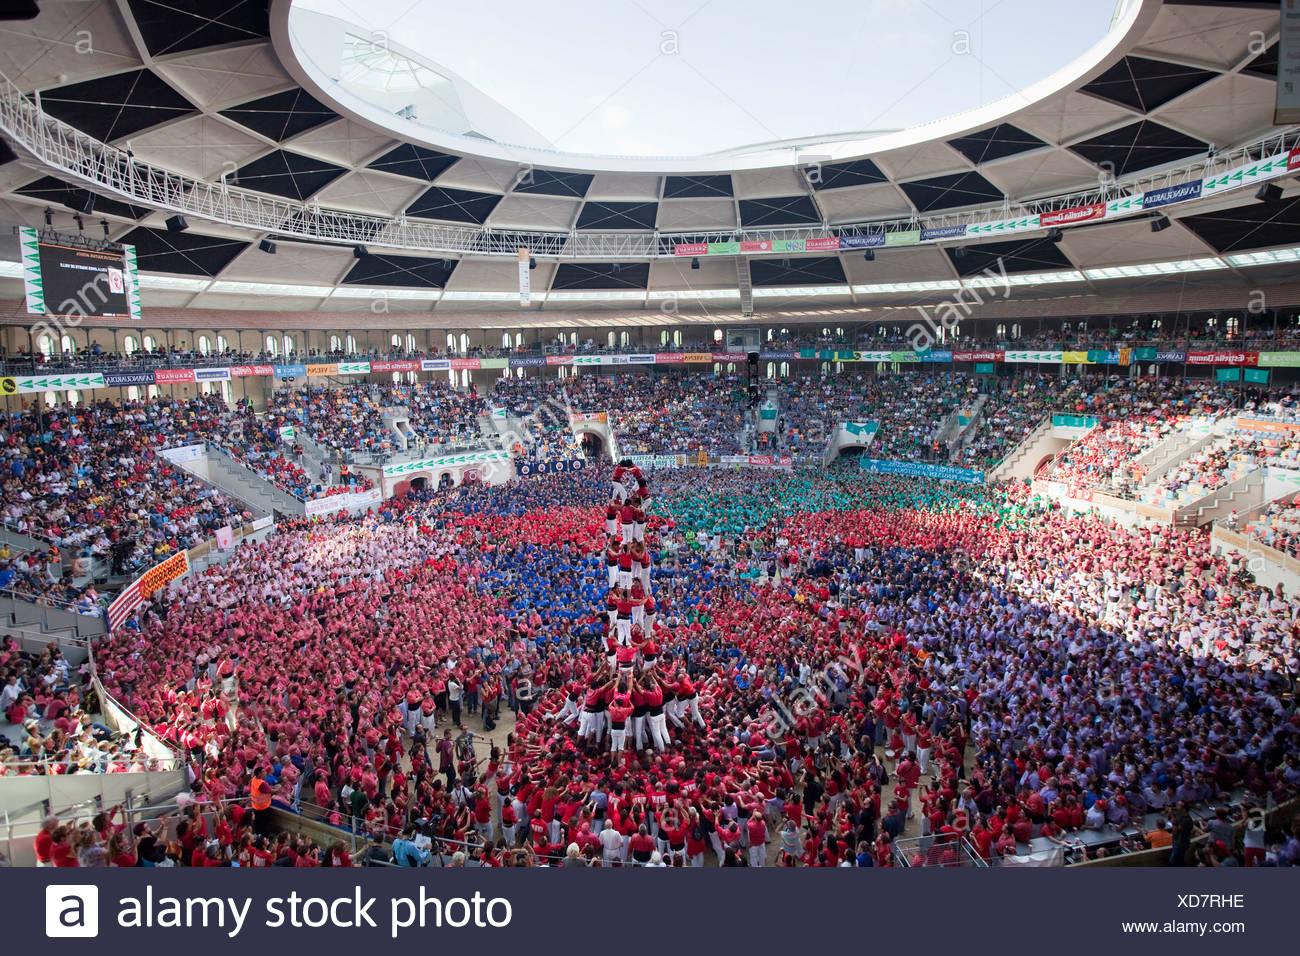 Spanien, Europa, Tarragona, Catalonia, stadio Castellers, festival, piramide umana, masse, Castells, tradizione Immagini Stock